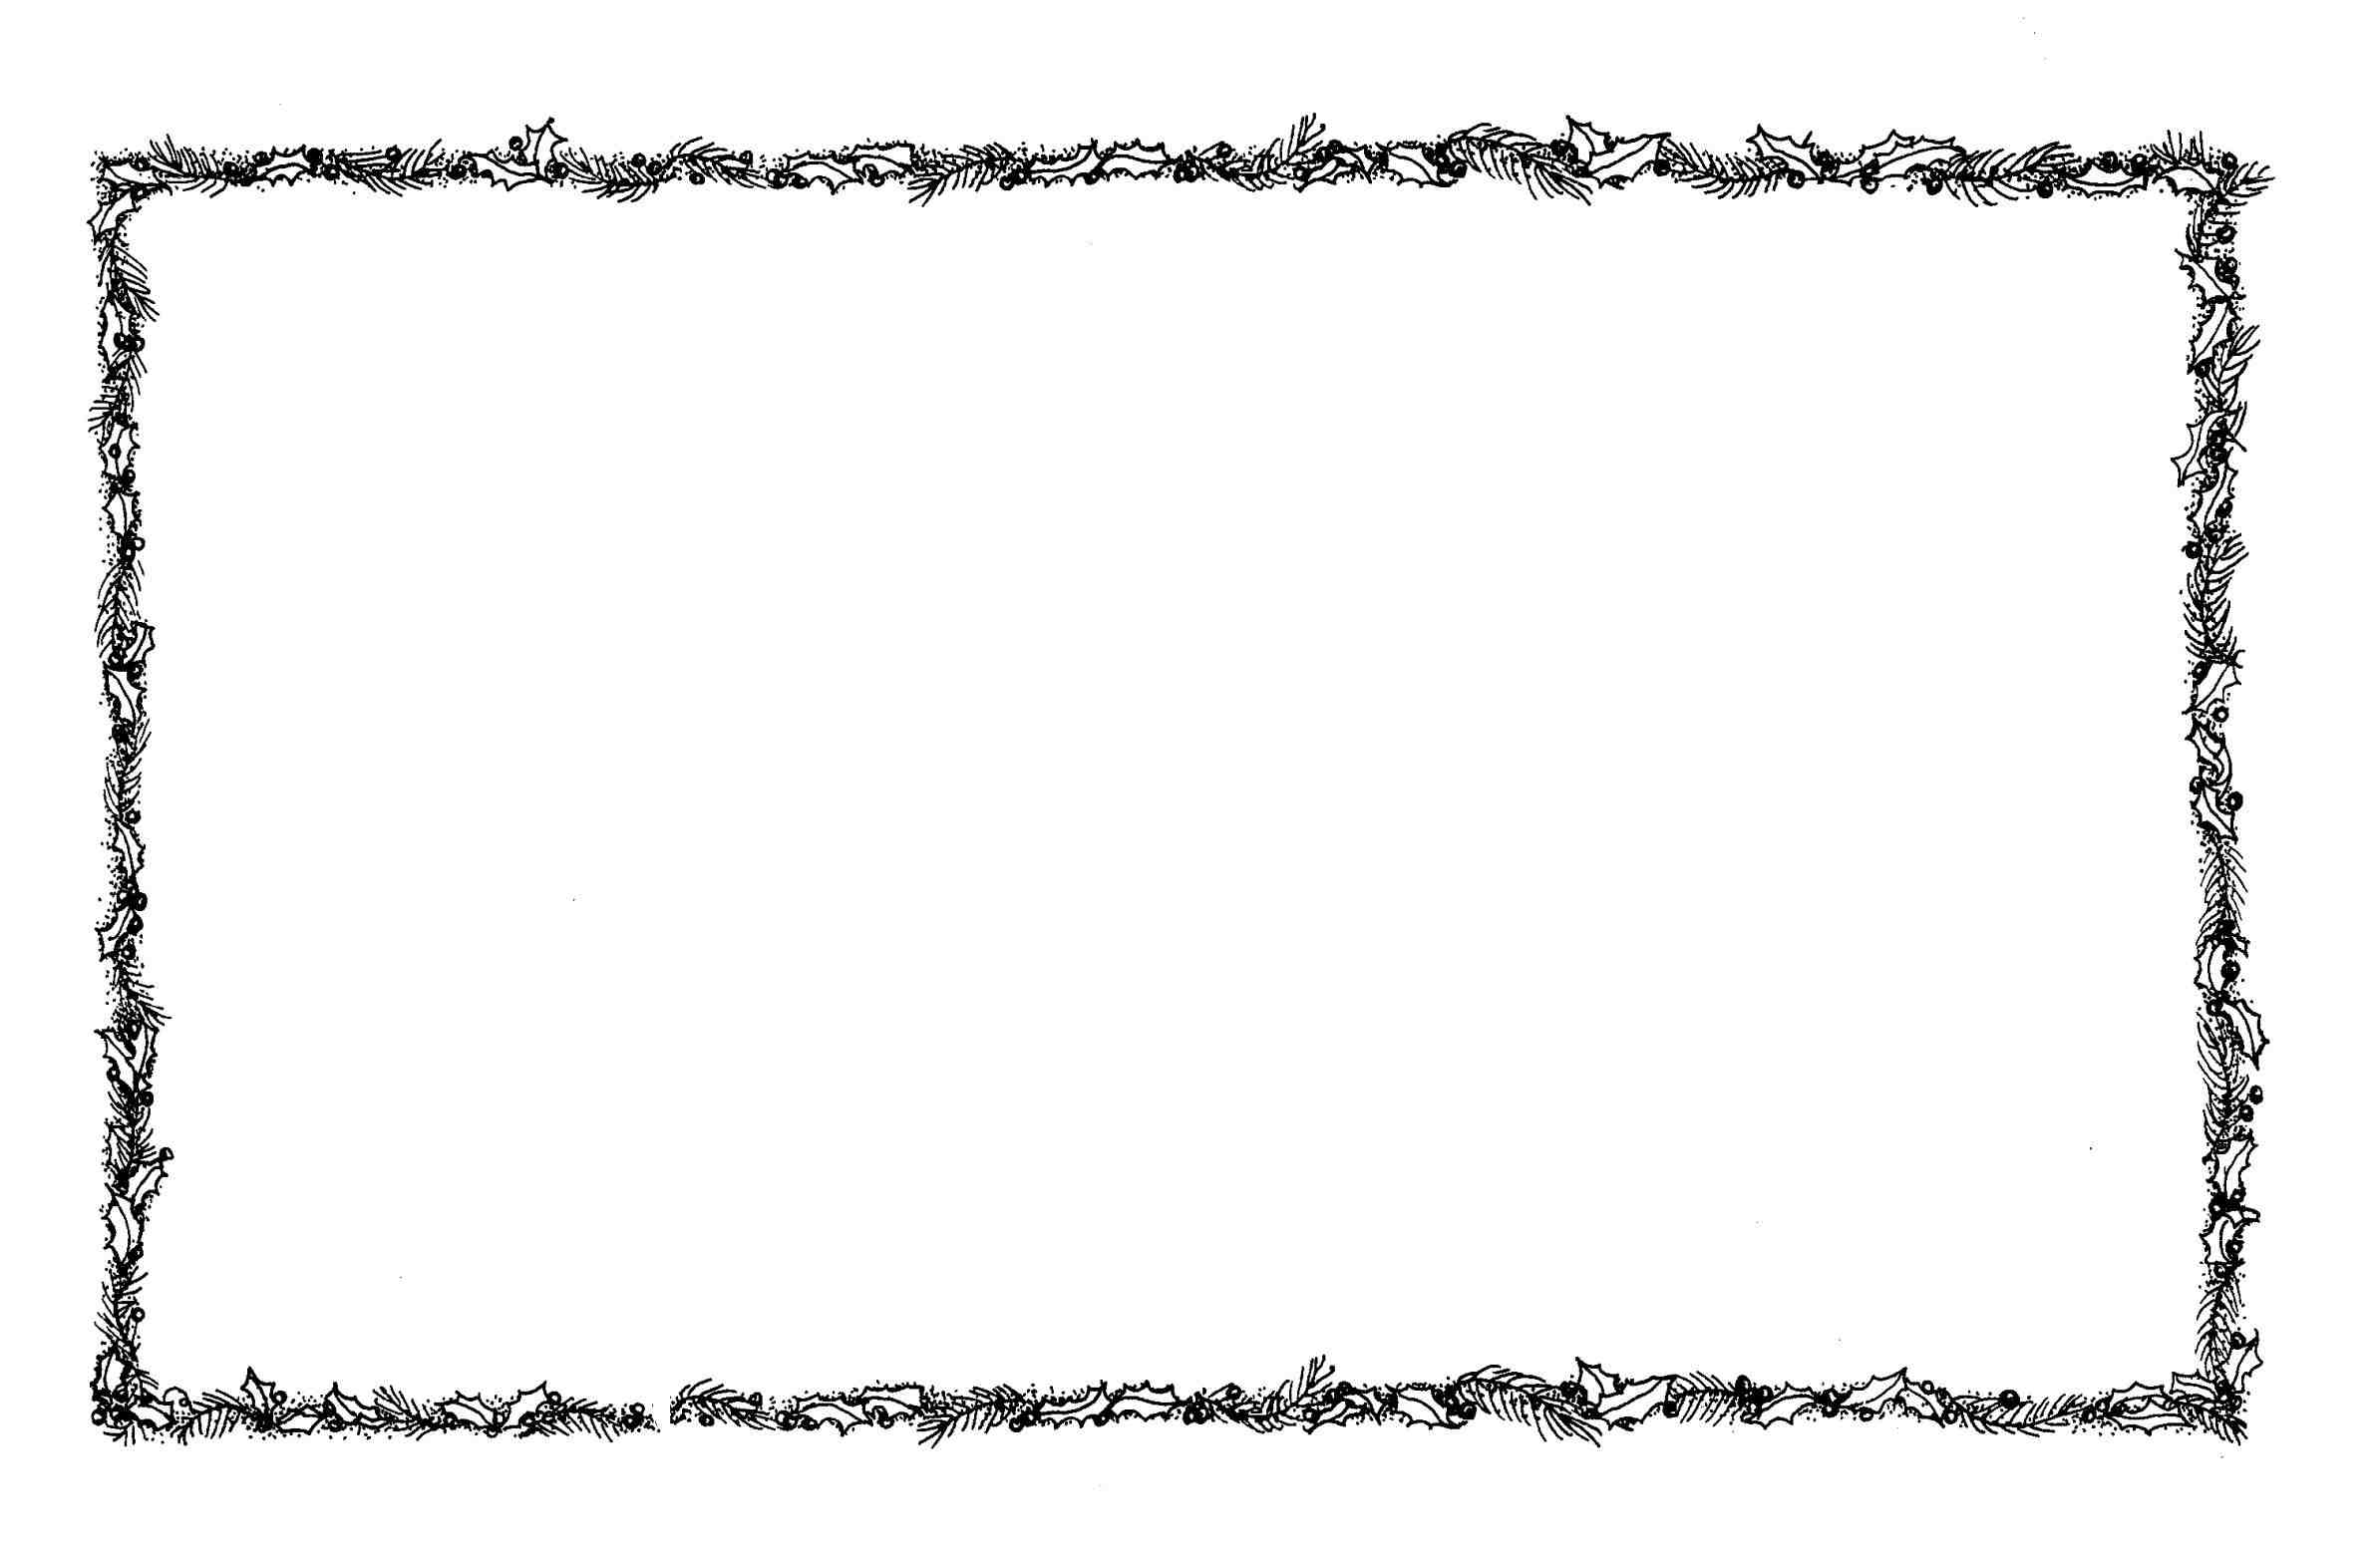 2387x1568 Christmas Music Notes Border Cheminee.website